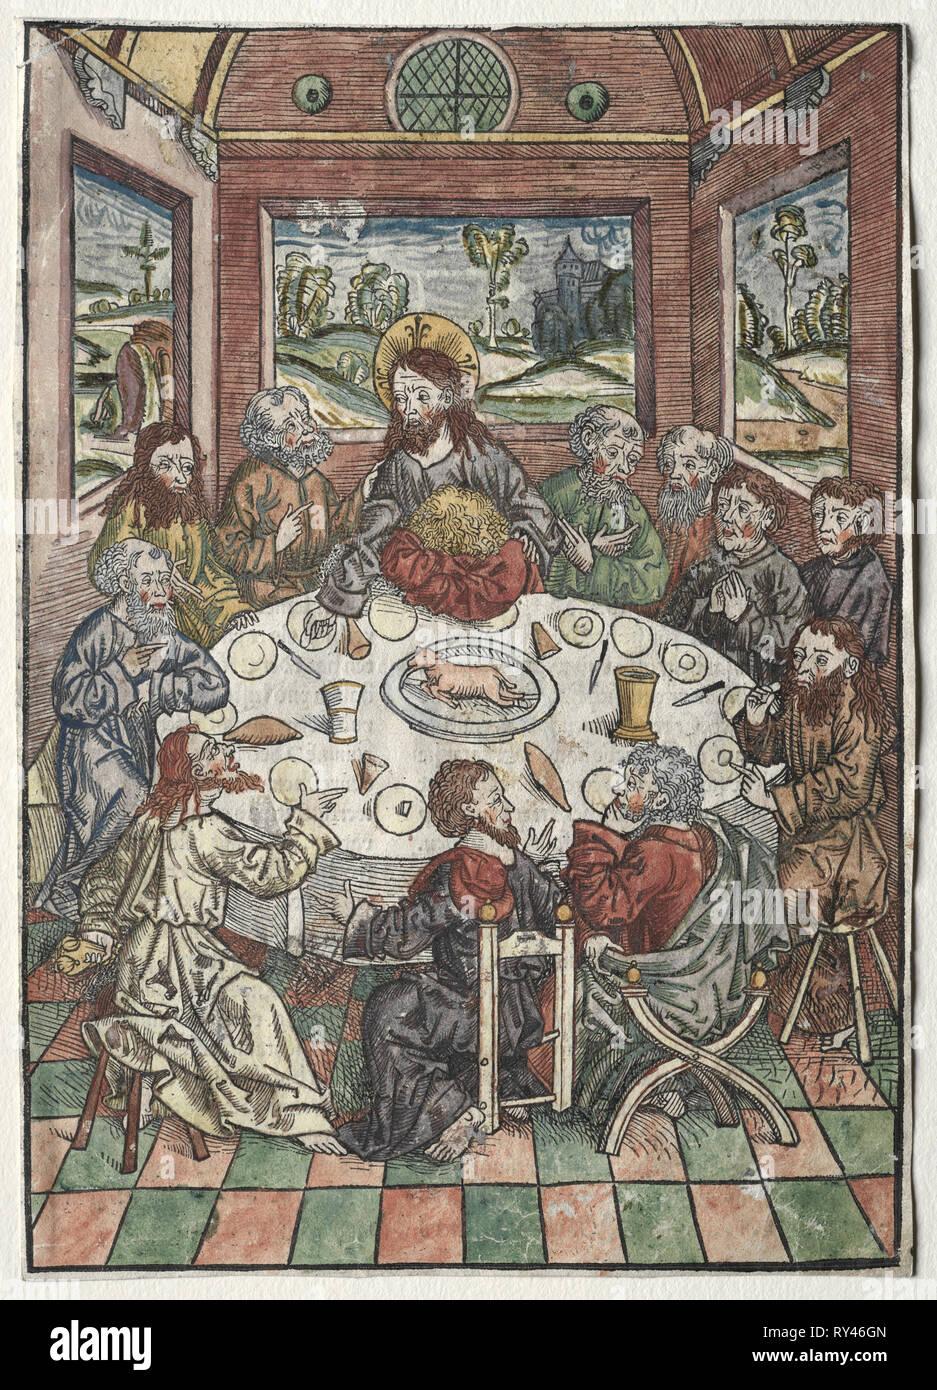 Der Schatzbehalter: L'Ultima Cena, 1491. Michael Wolgemut (Tedesco, 1434-1519). Xilografia a colori Immagini Stock